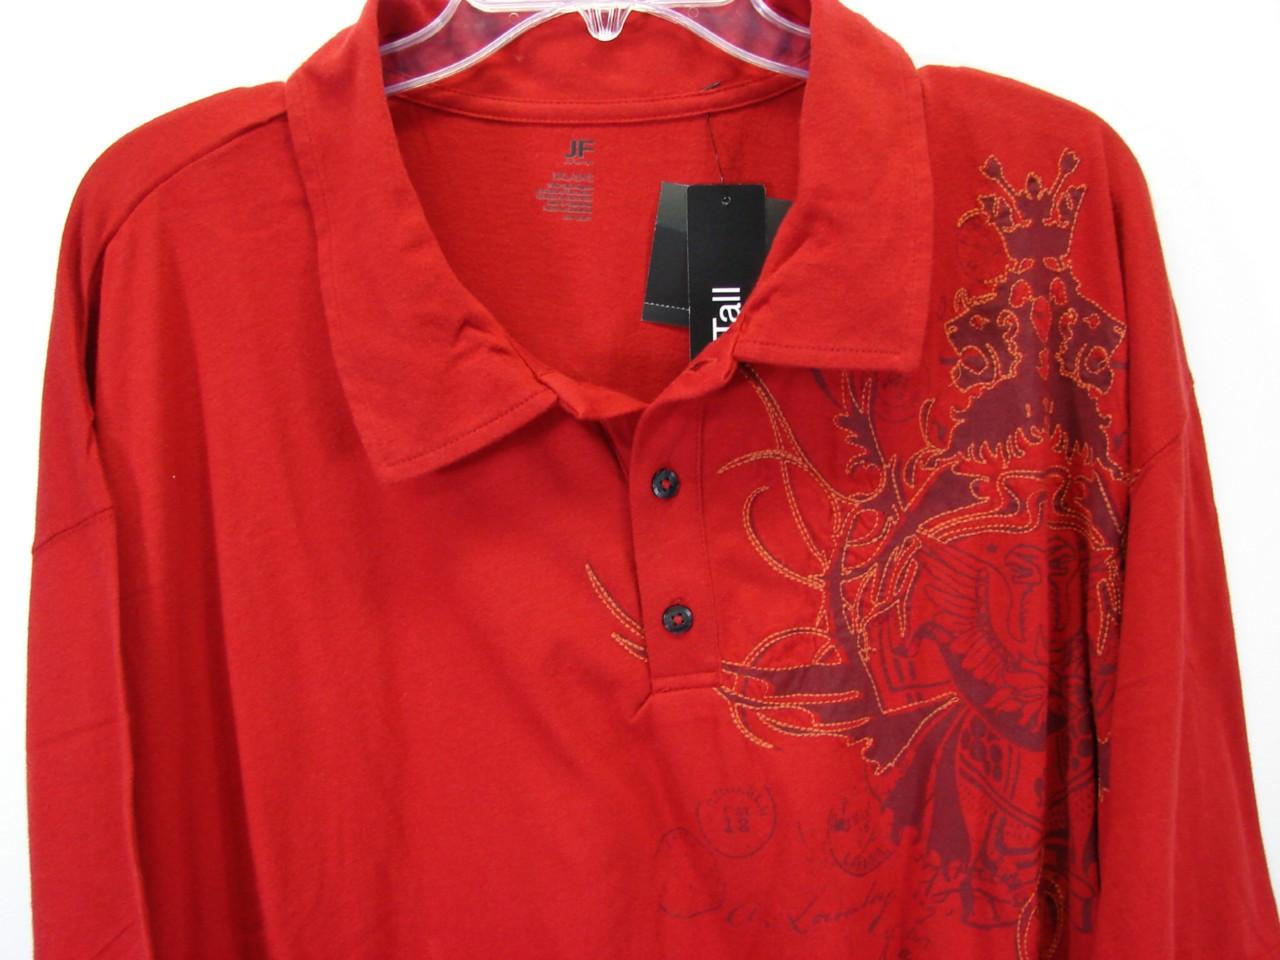 Nwt sleek red jf j ferrar mens big tall polo shirt size for Big size polo shirts